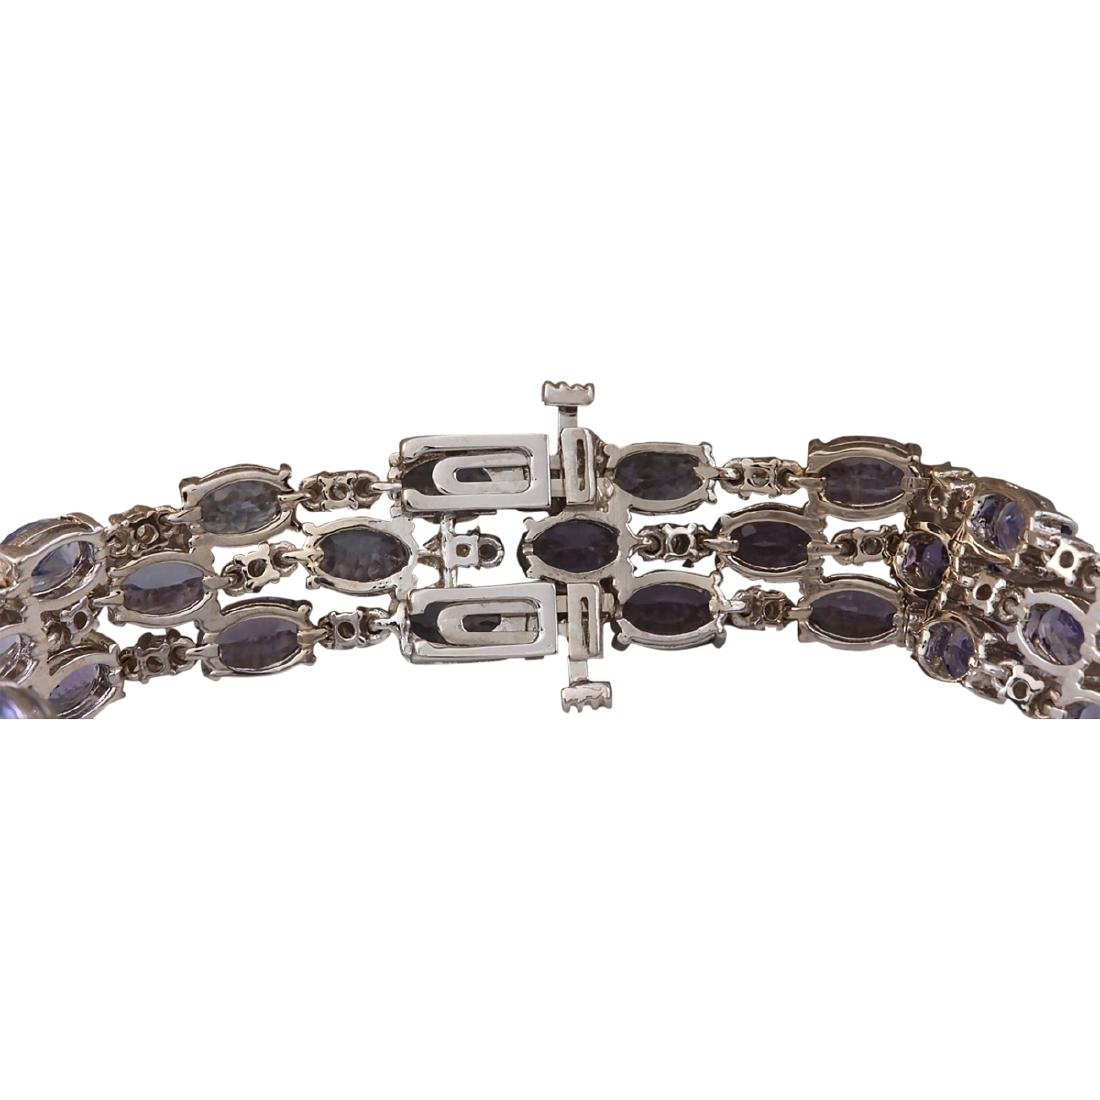 23.85 CTW Natural Tanzanite And Dimond Bracelet In 18K - 2